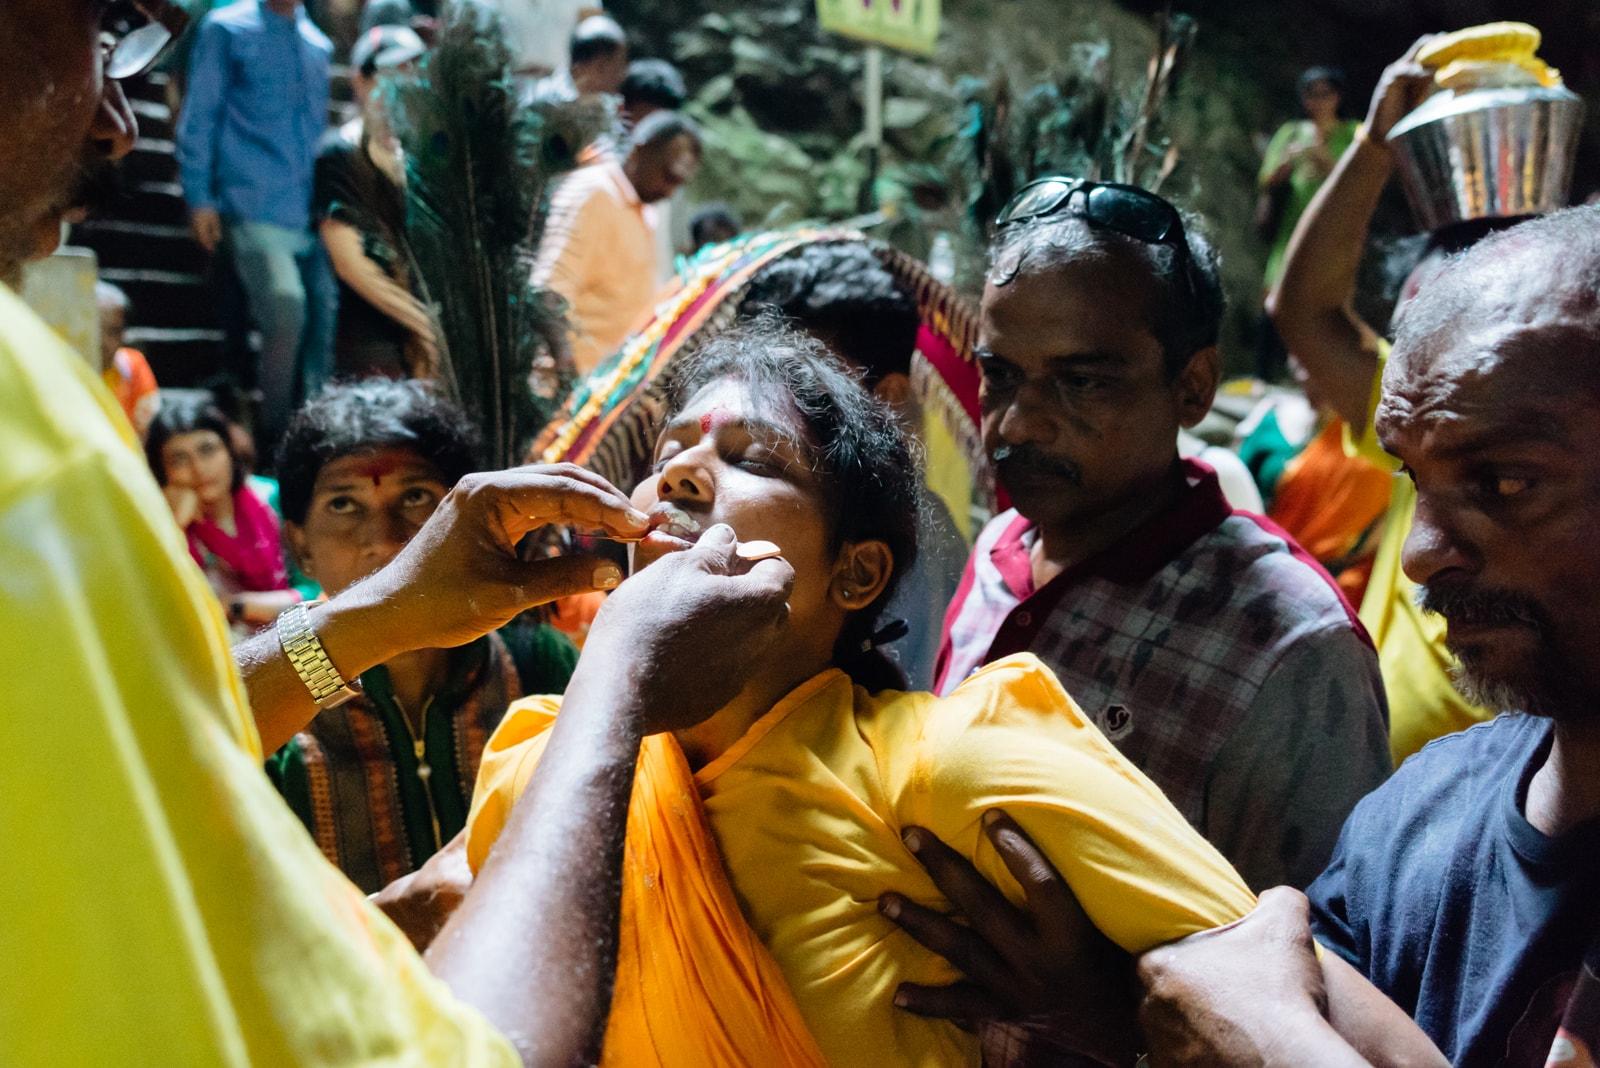 Thaipusam: The Tamil Festival of Hindu Devotion